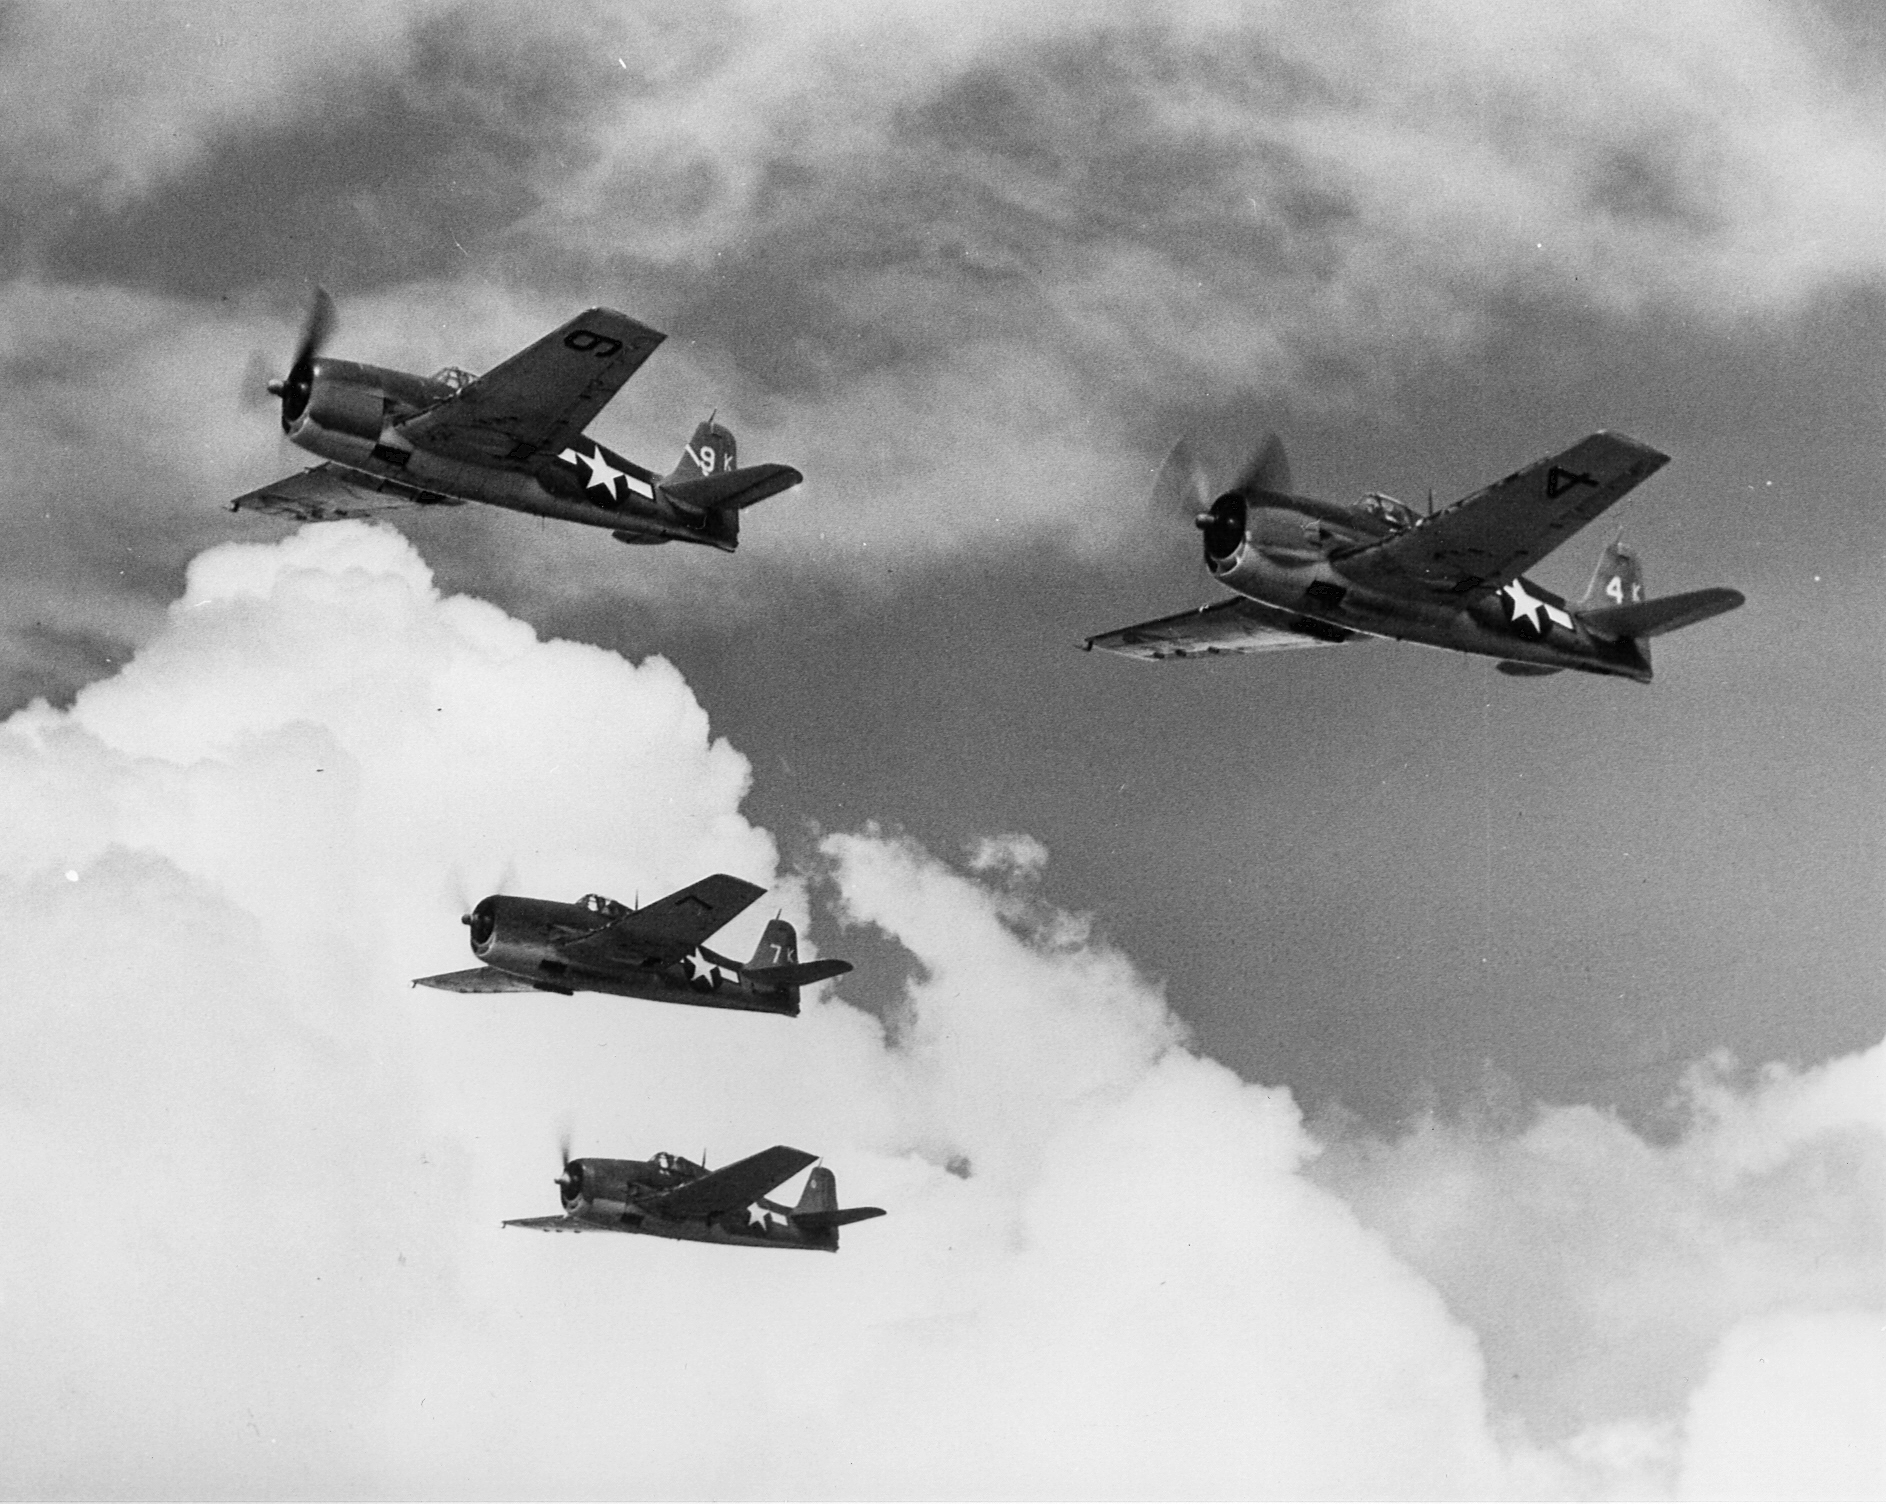 Grumman F6F 3 Hellcat VF 1 White K0, K7, K9 and K4 in formation CV 10 USS Yorktown II June 1944 03